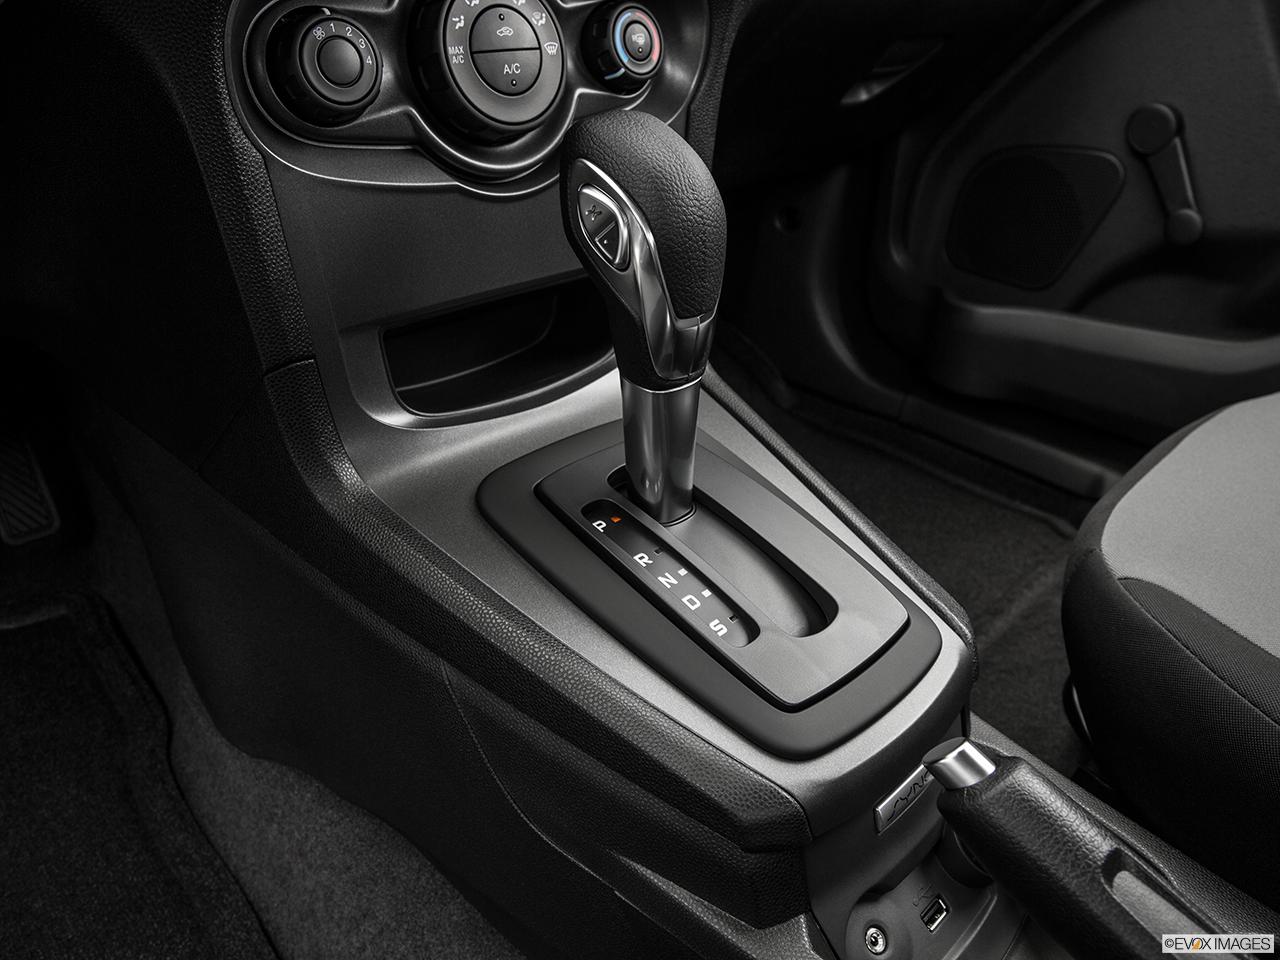 2019 Ford Fiesta photo